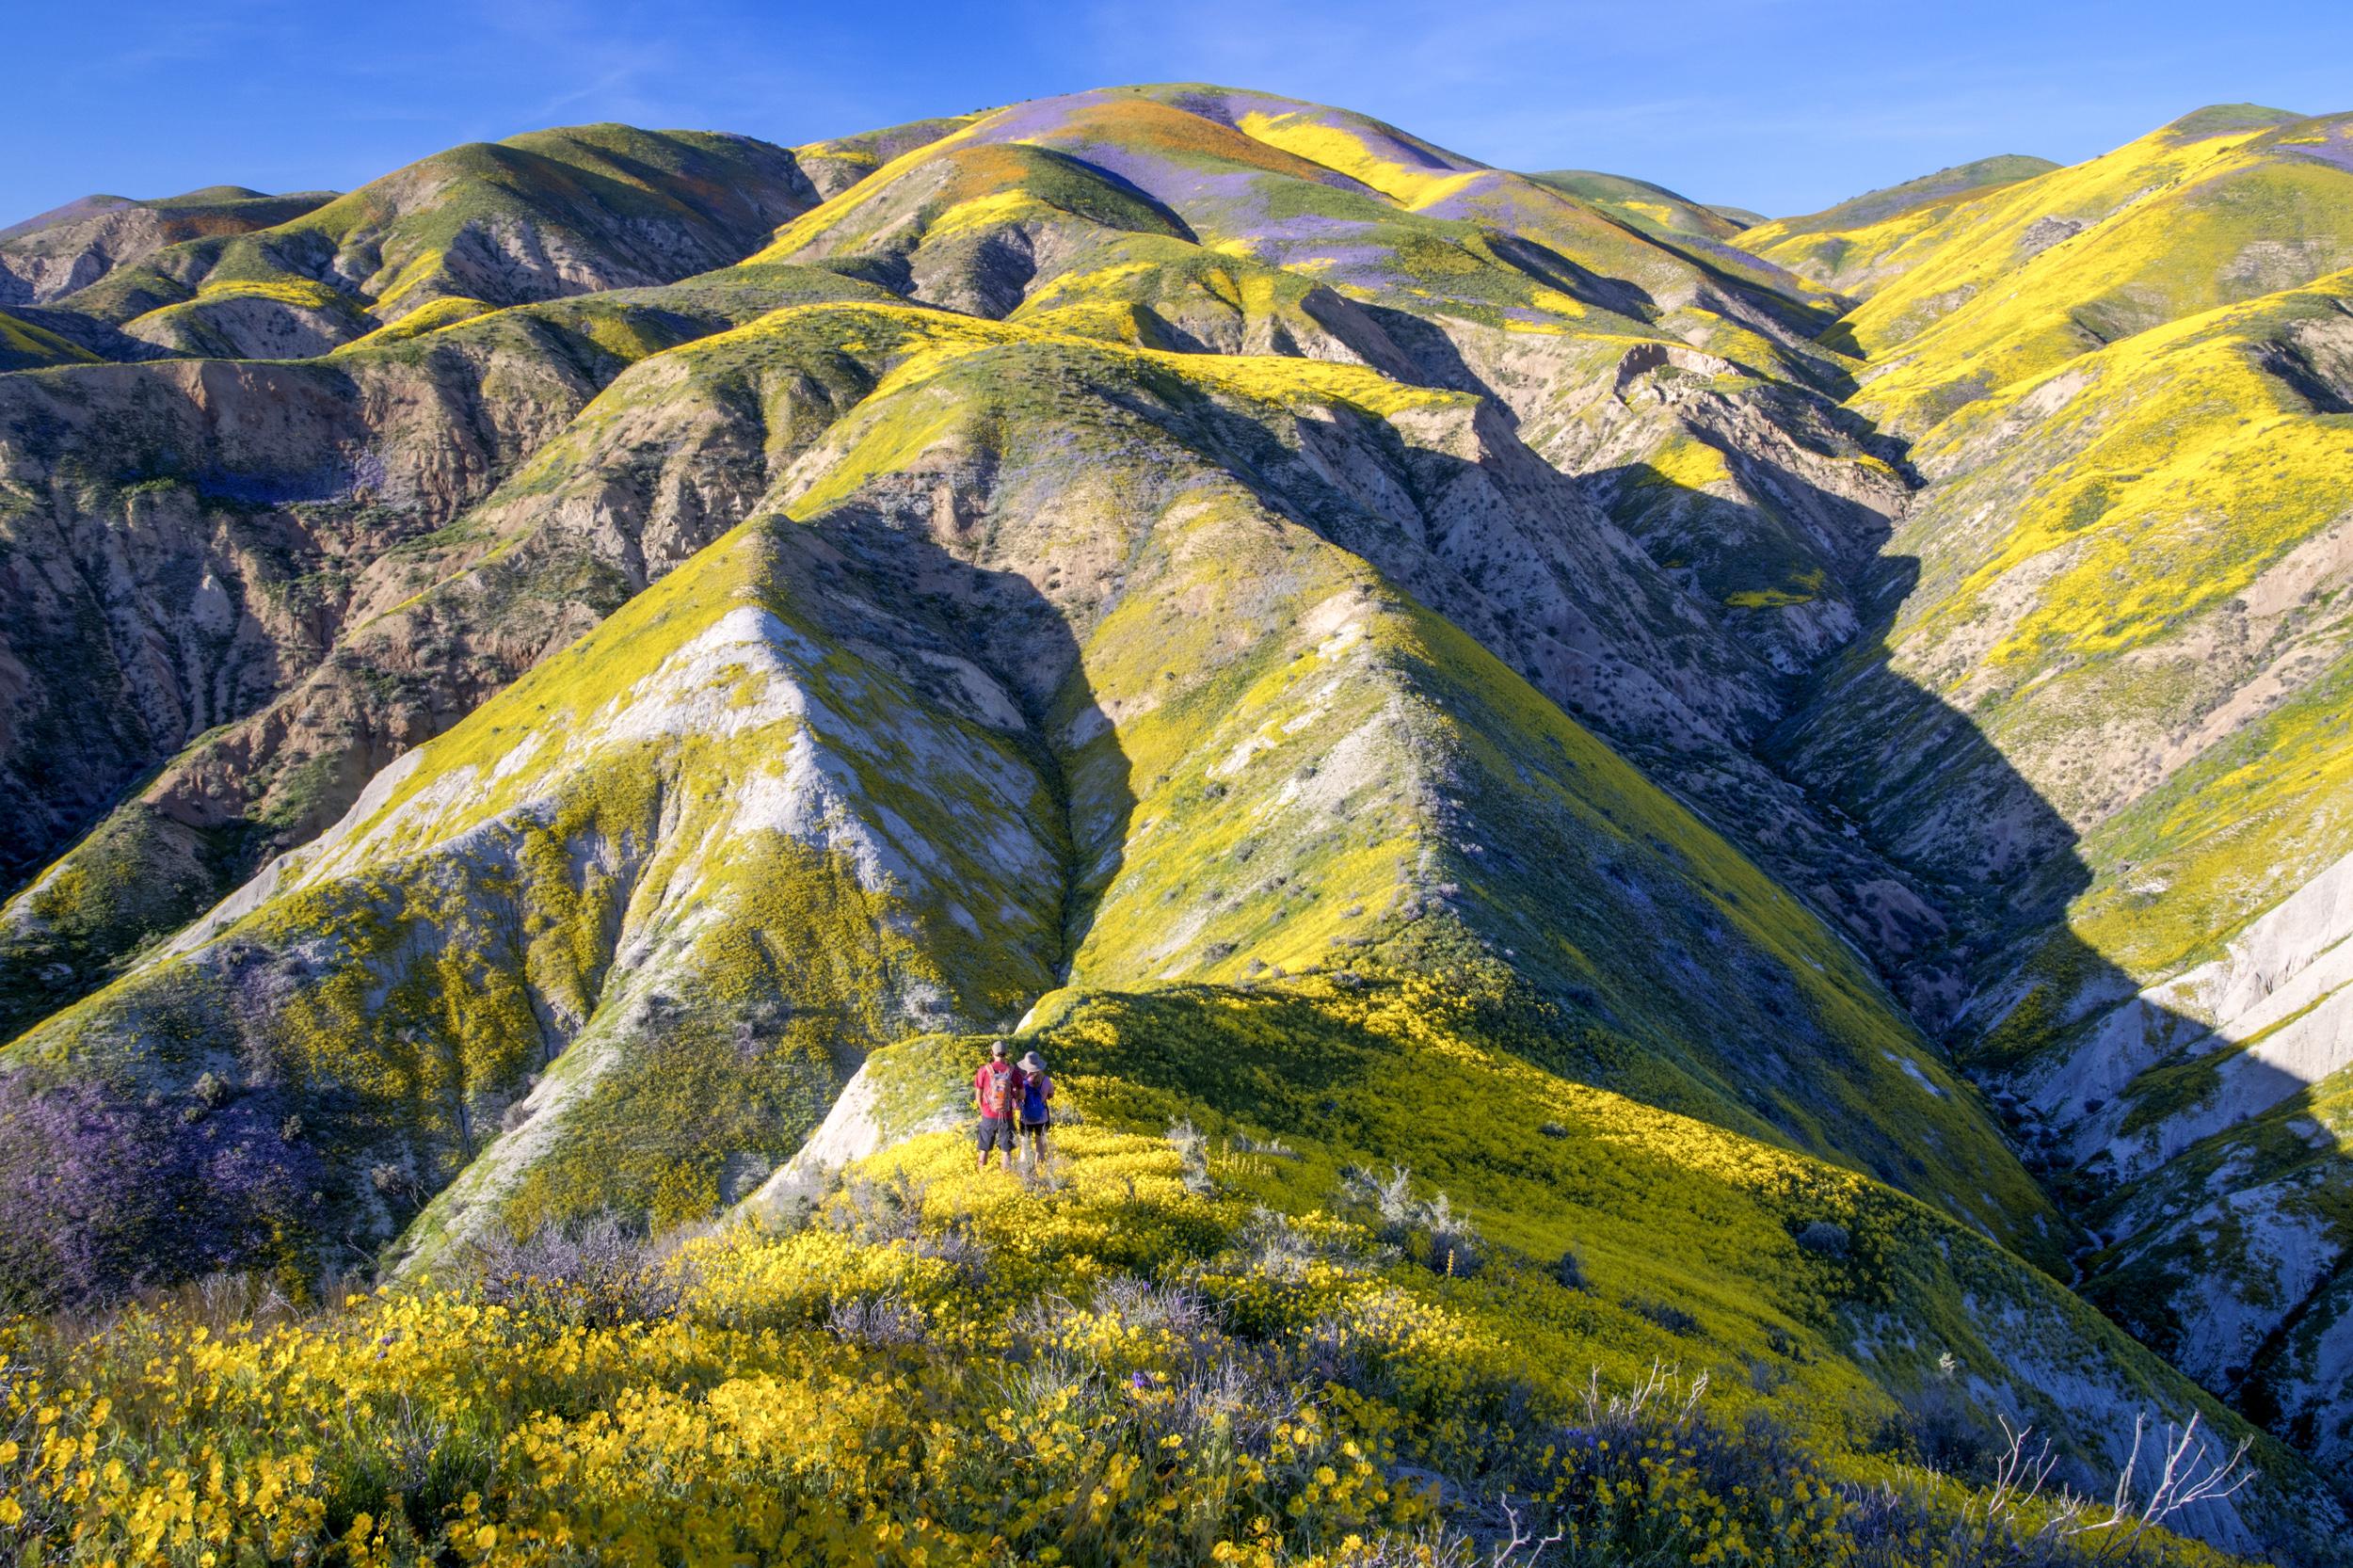 Temblor Range Wildflowers. © Bob Wick, BLM